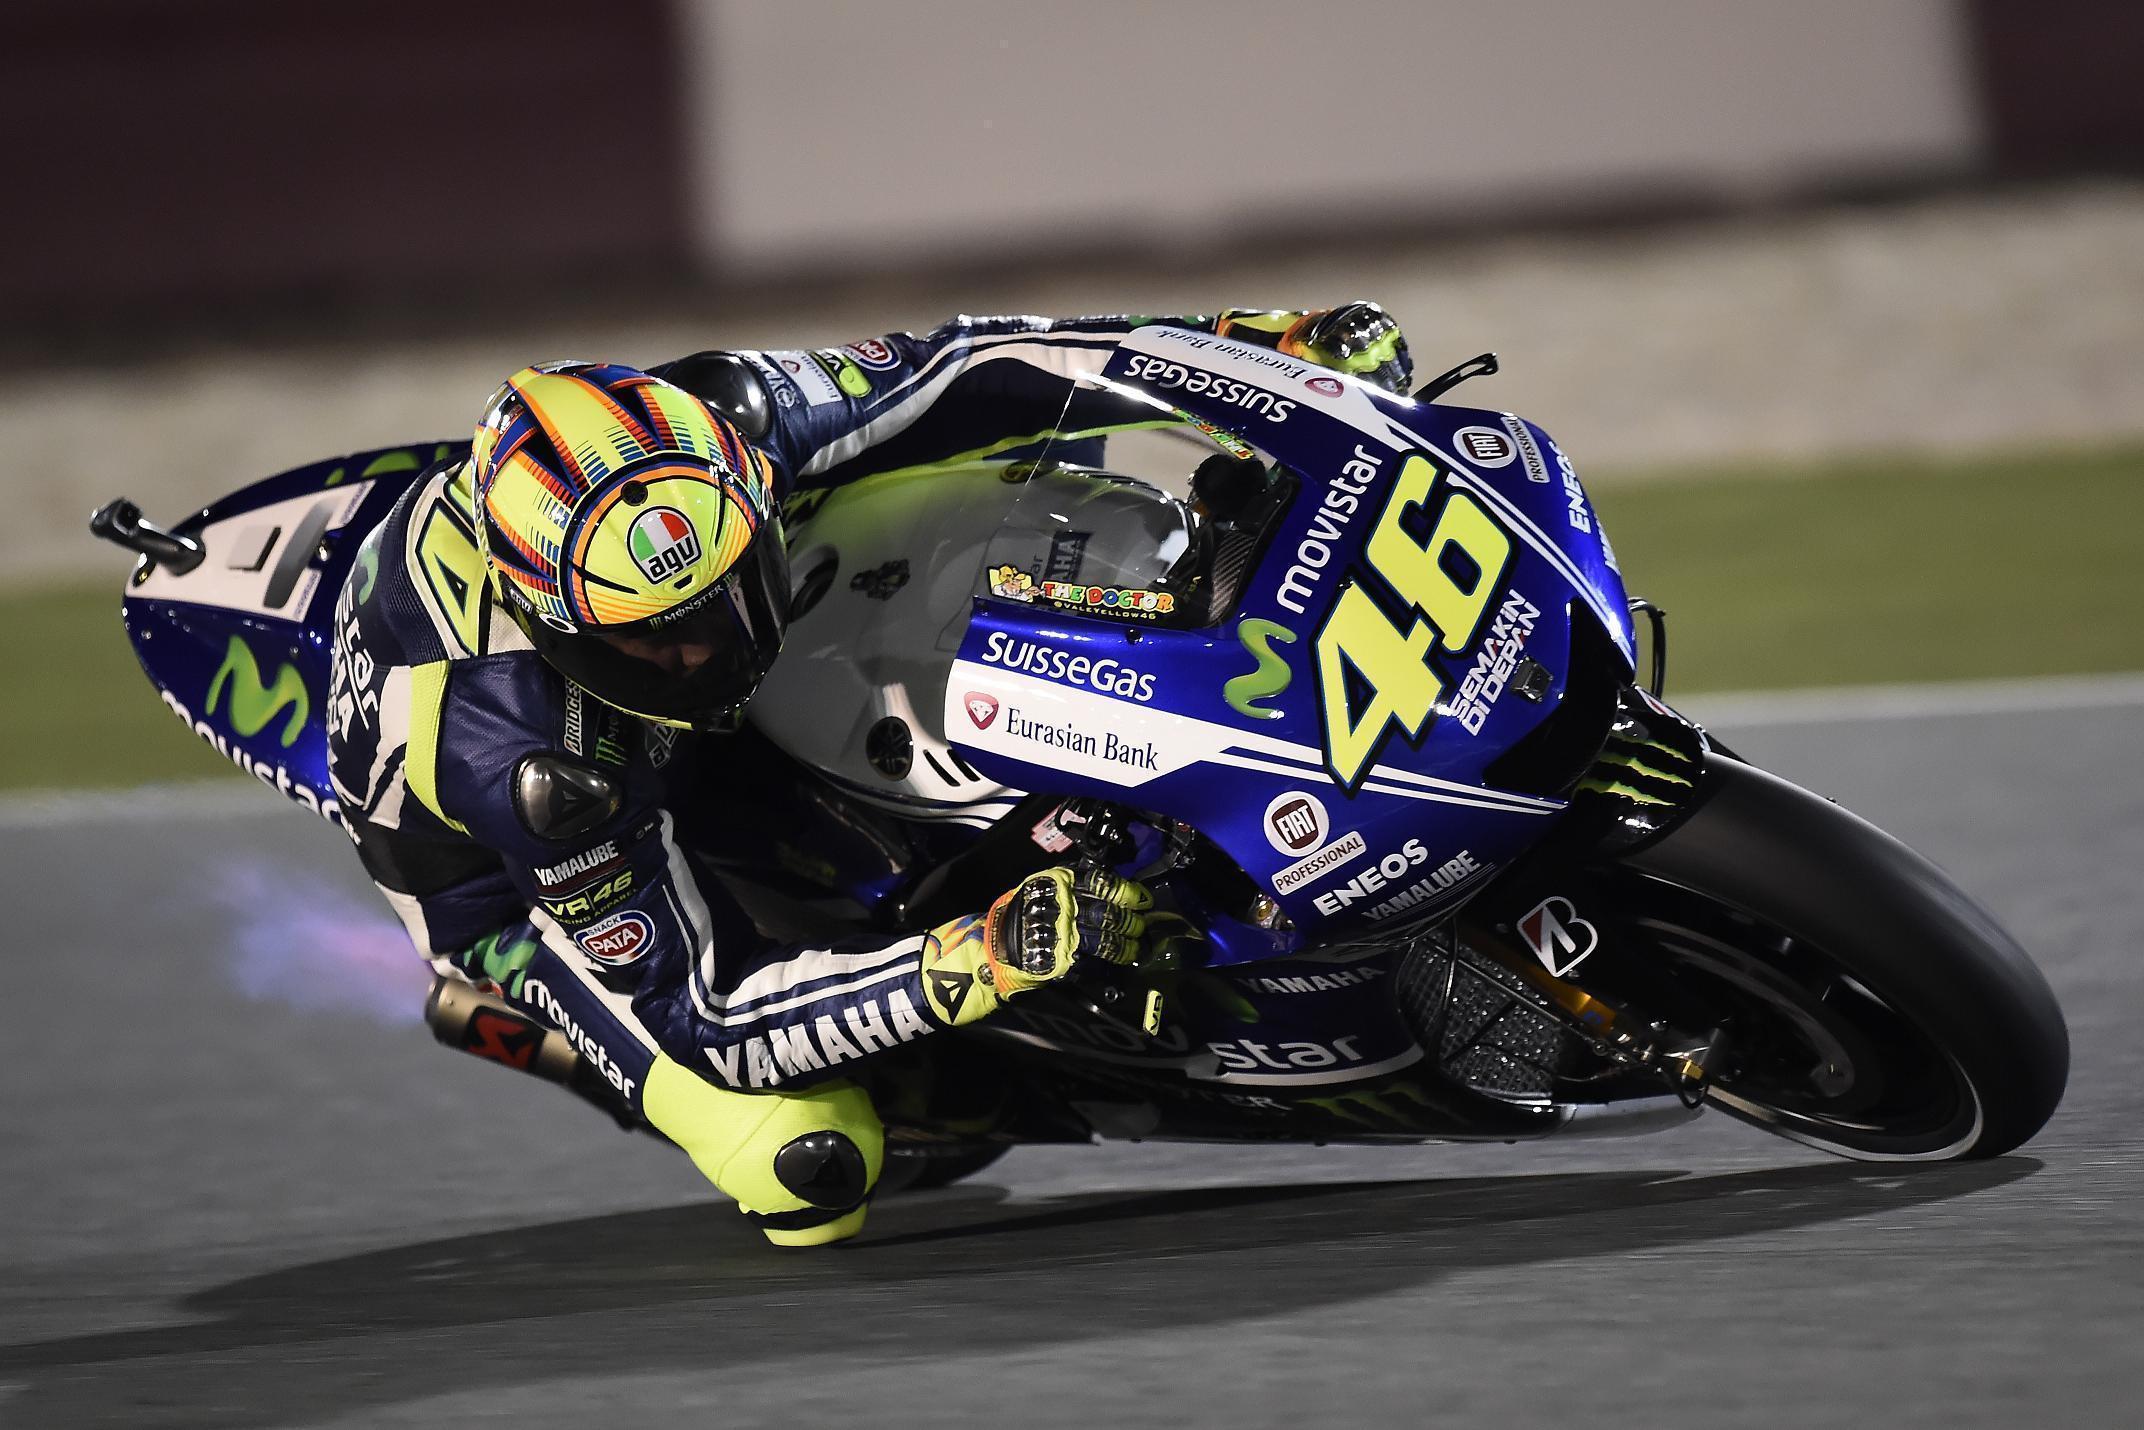 Valentino Rossi Movistar Yamaha 2014 MotoGP Wallpaper Wide or HD ...